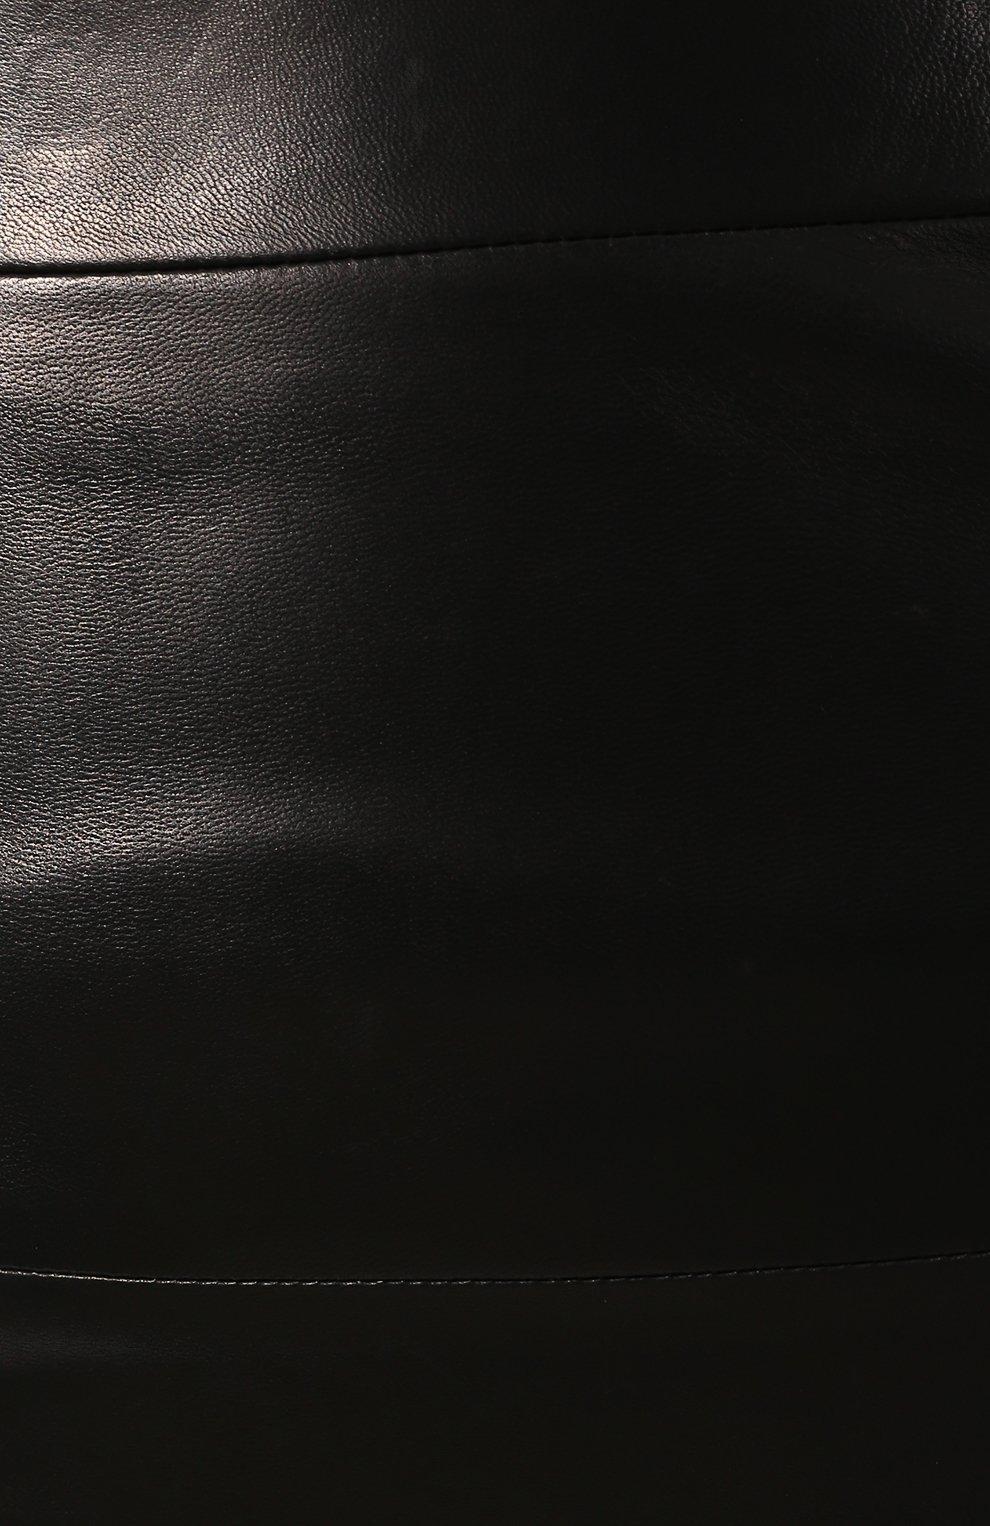 Кожаная юбка-карандаш | Фото №5